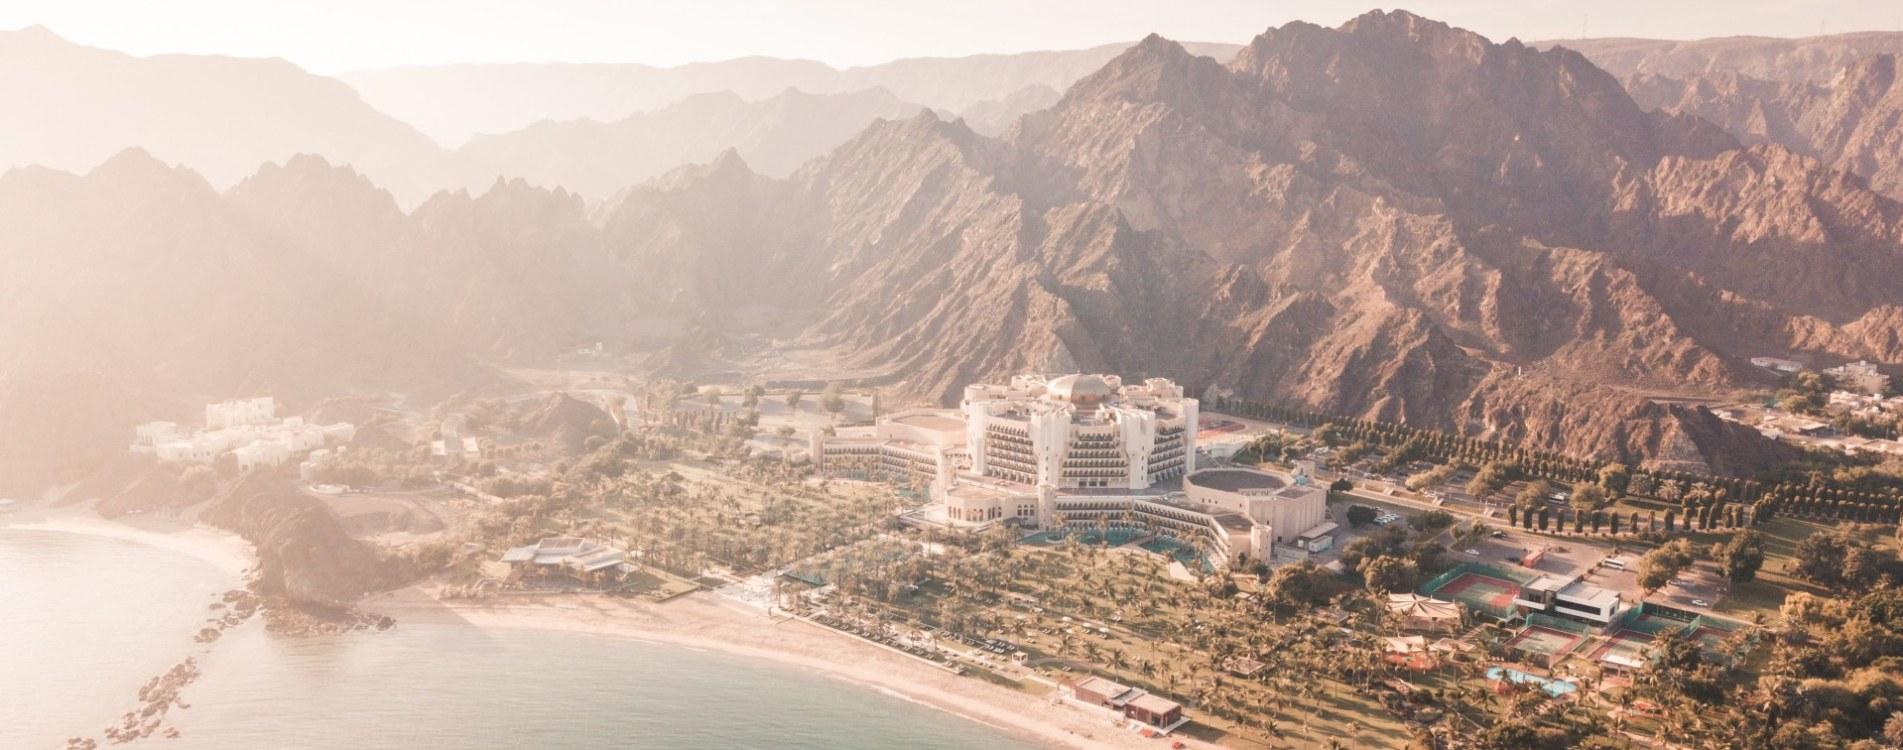 Al-Bustan-Palace-Muskat-Al-Bustan-Palace-Panorama-Luftbildaufnahme-Oman.jpg